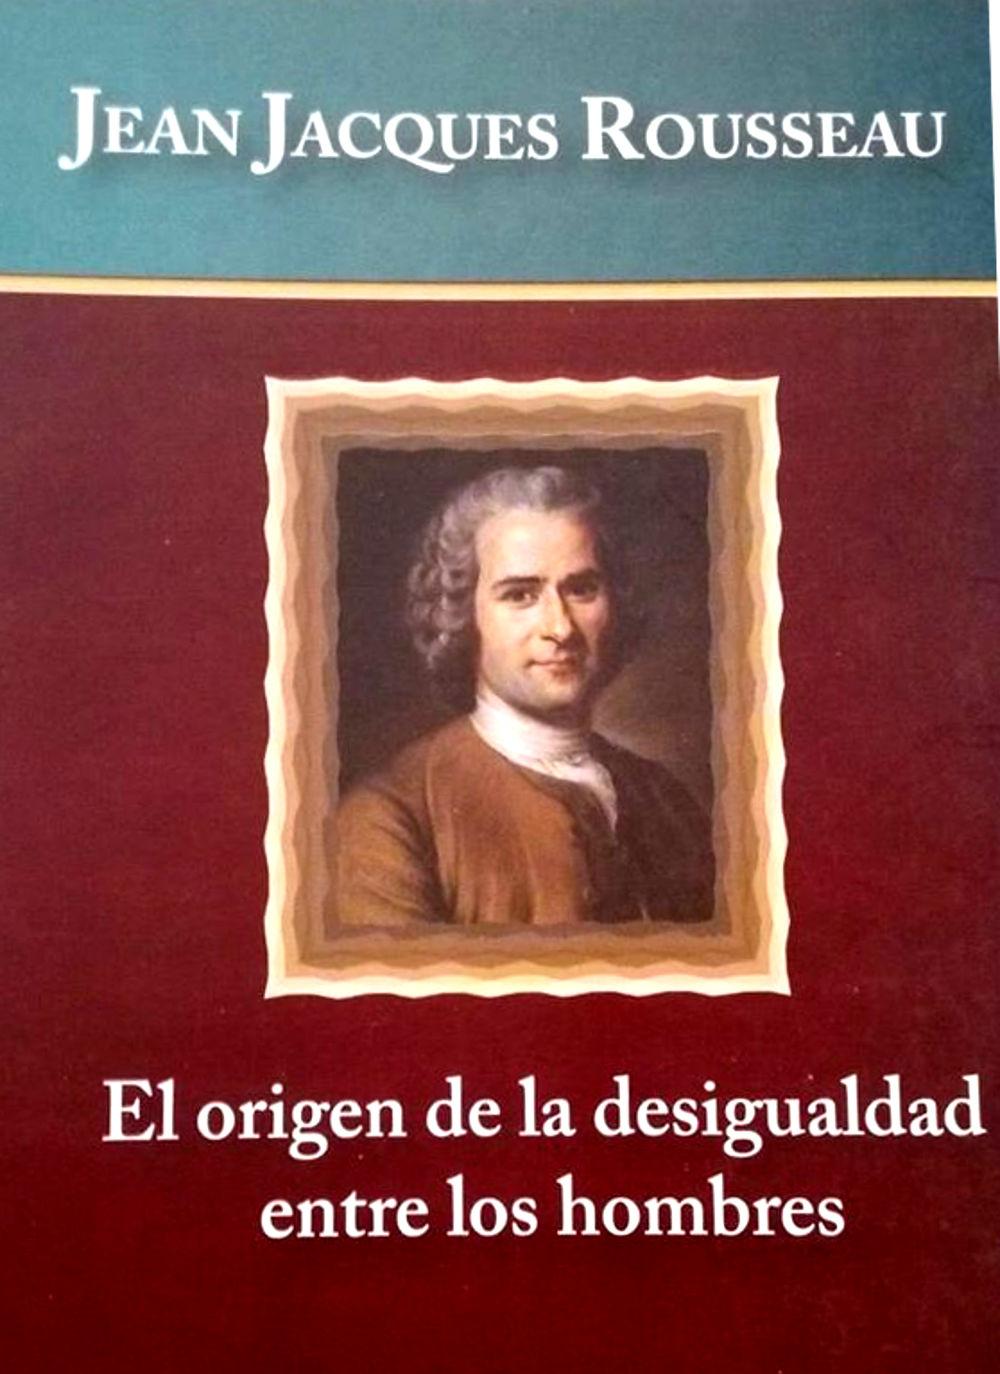 Rousseau, Juan Jacobo - La desigualdad entre los hombres